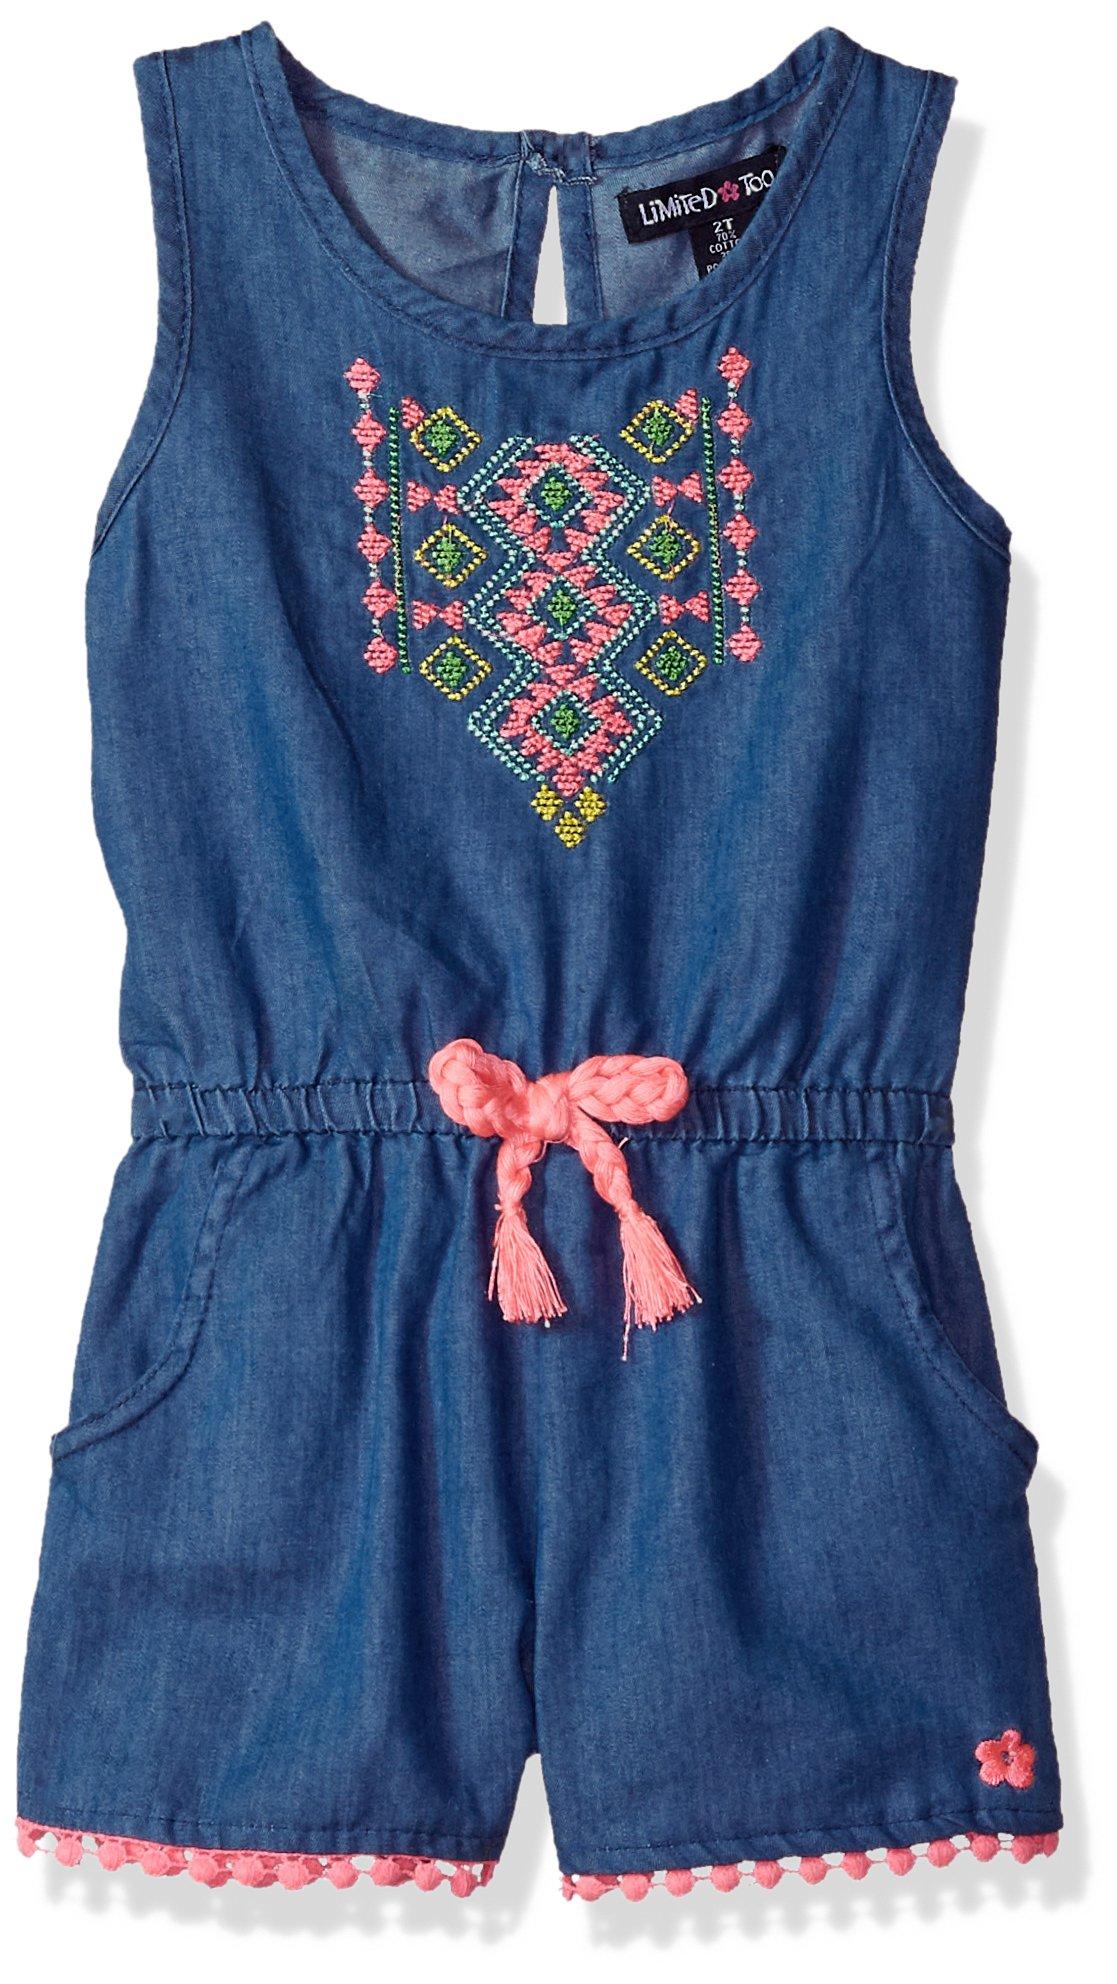 Limited Too Girls' Toddler Romper, Elastic Waist with Tassel tie Medium Blue Denim, 2T